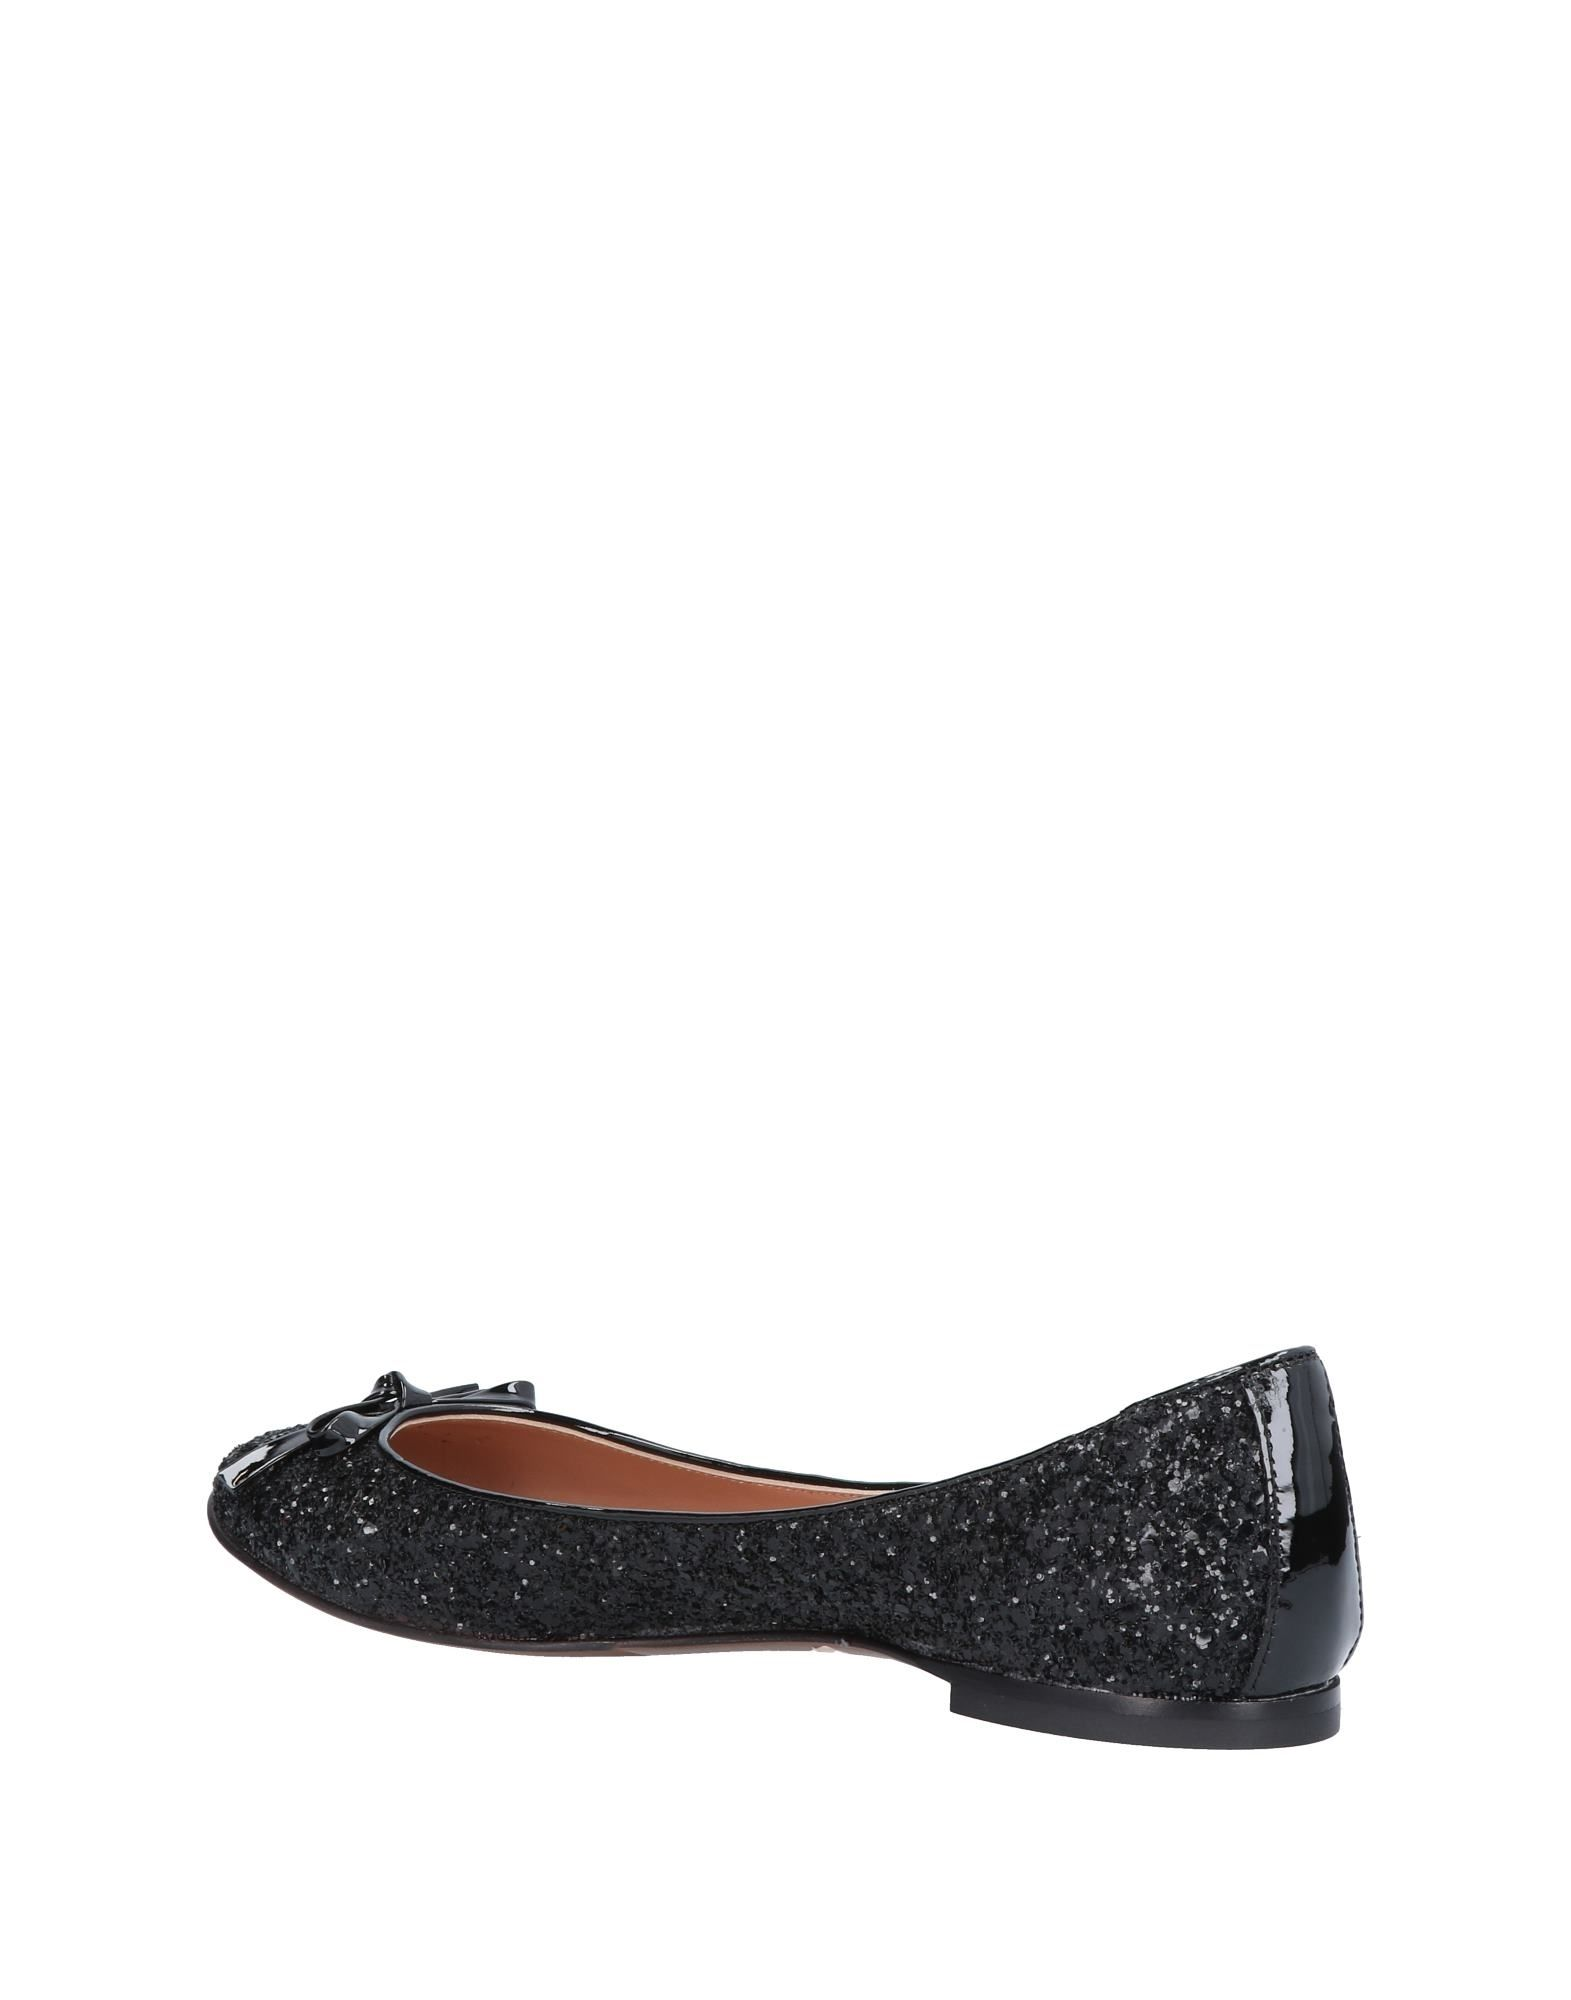 Stilvolle billige Schuhe L Autre Chose Ballerinas Damen 11487464LC 11487464LC Damen 39dc88